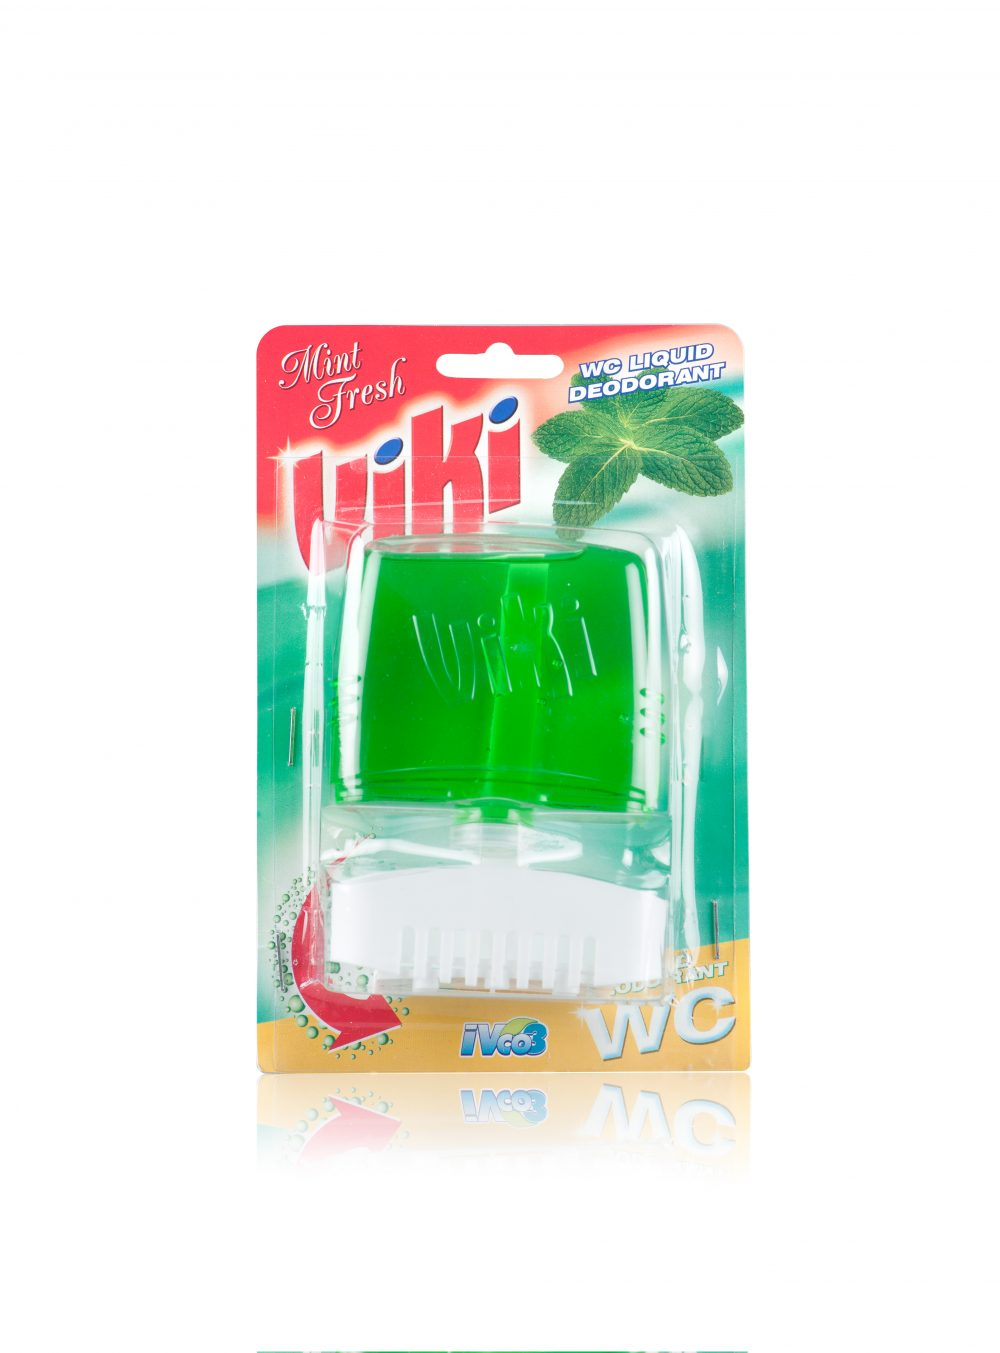 Viki Fresh WC Deodorant Mint Fresh